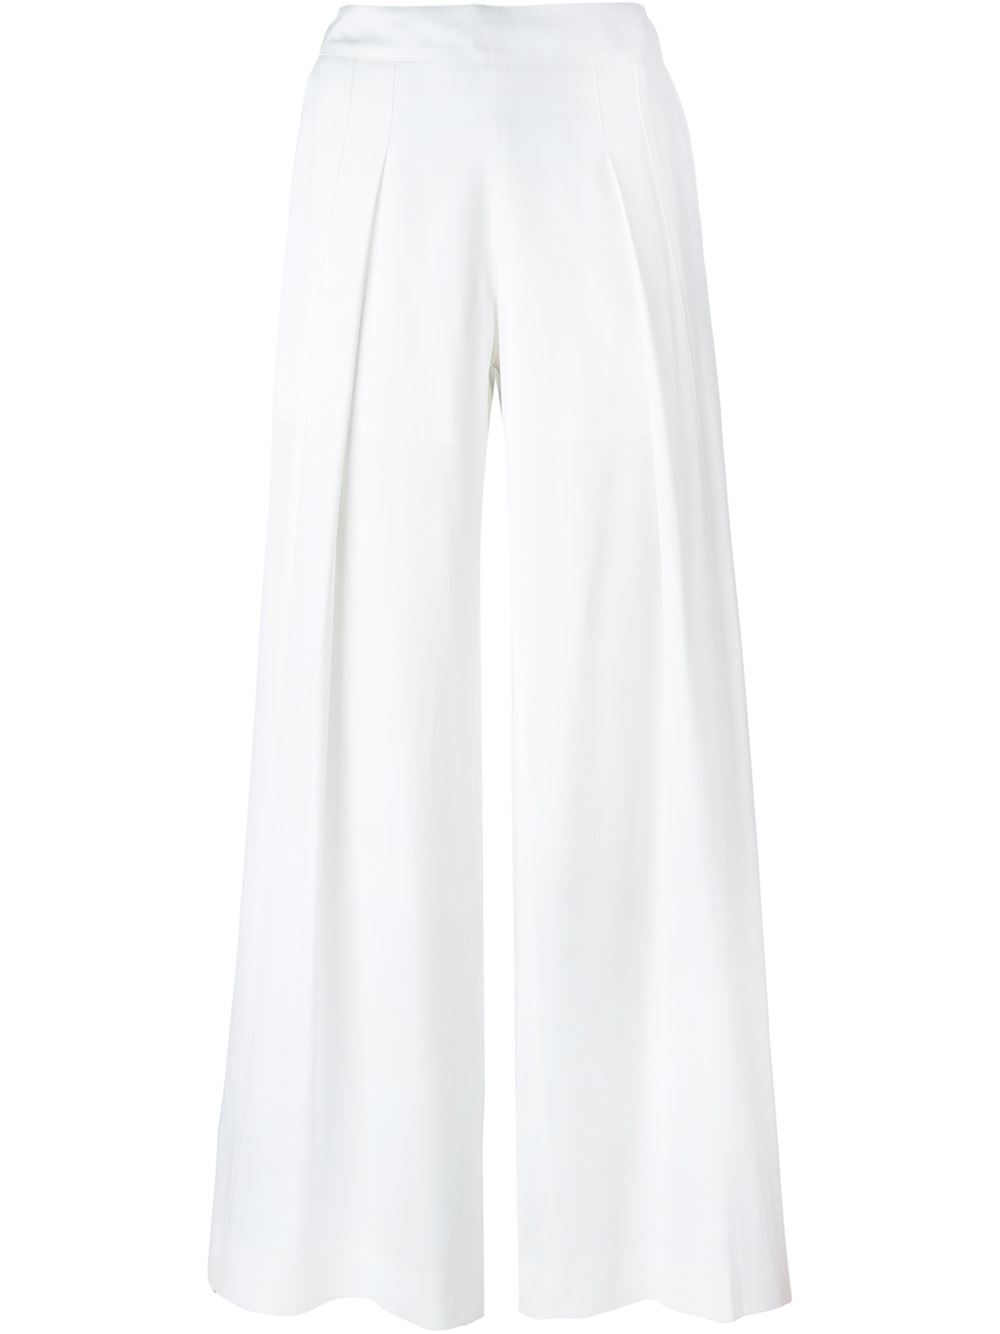 Kenzo Palazzo Pants In White Lyst